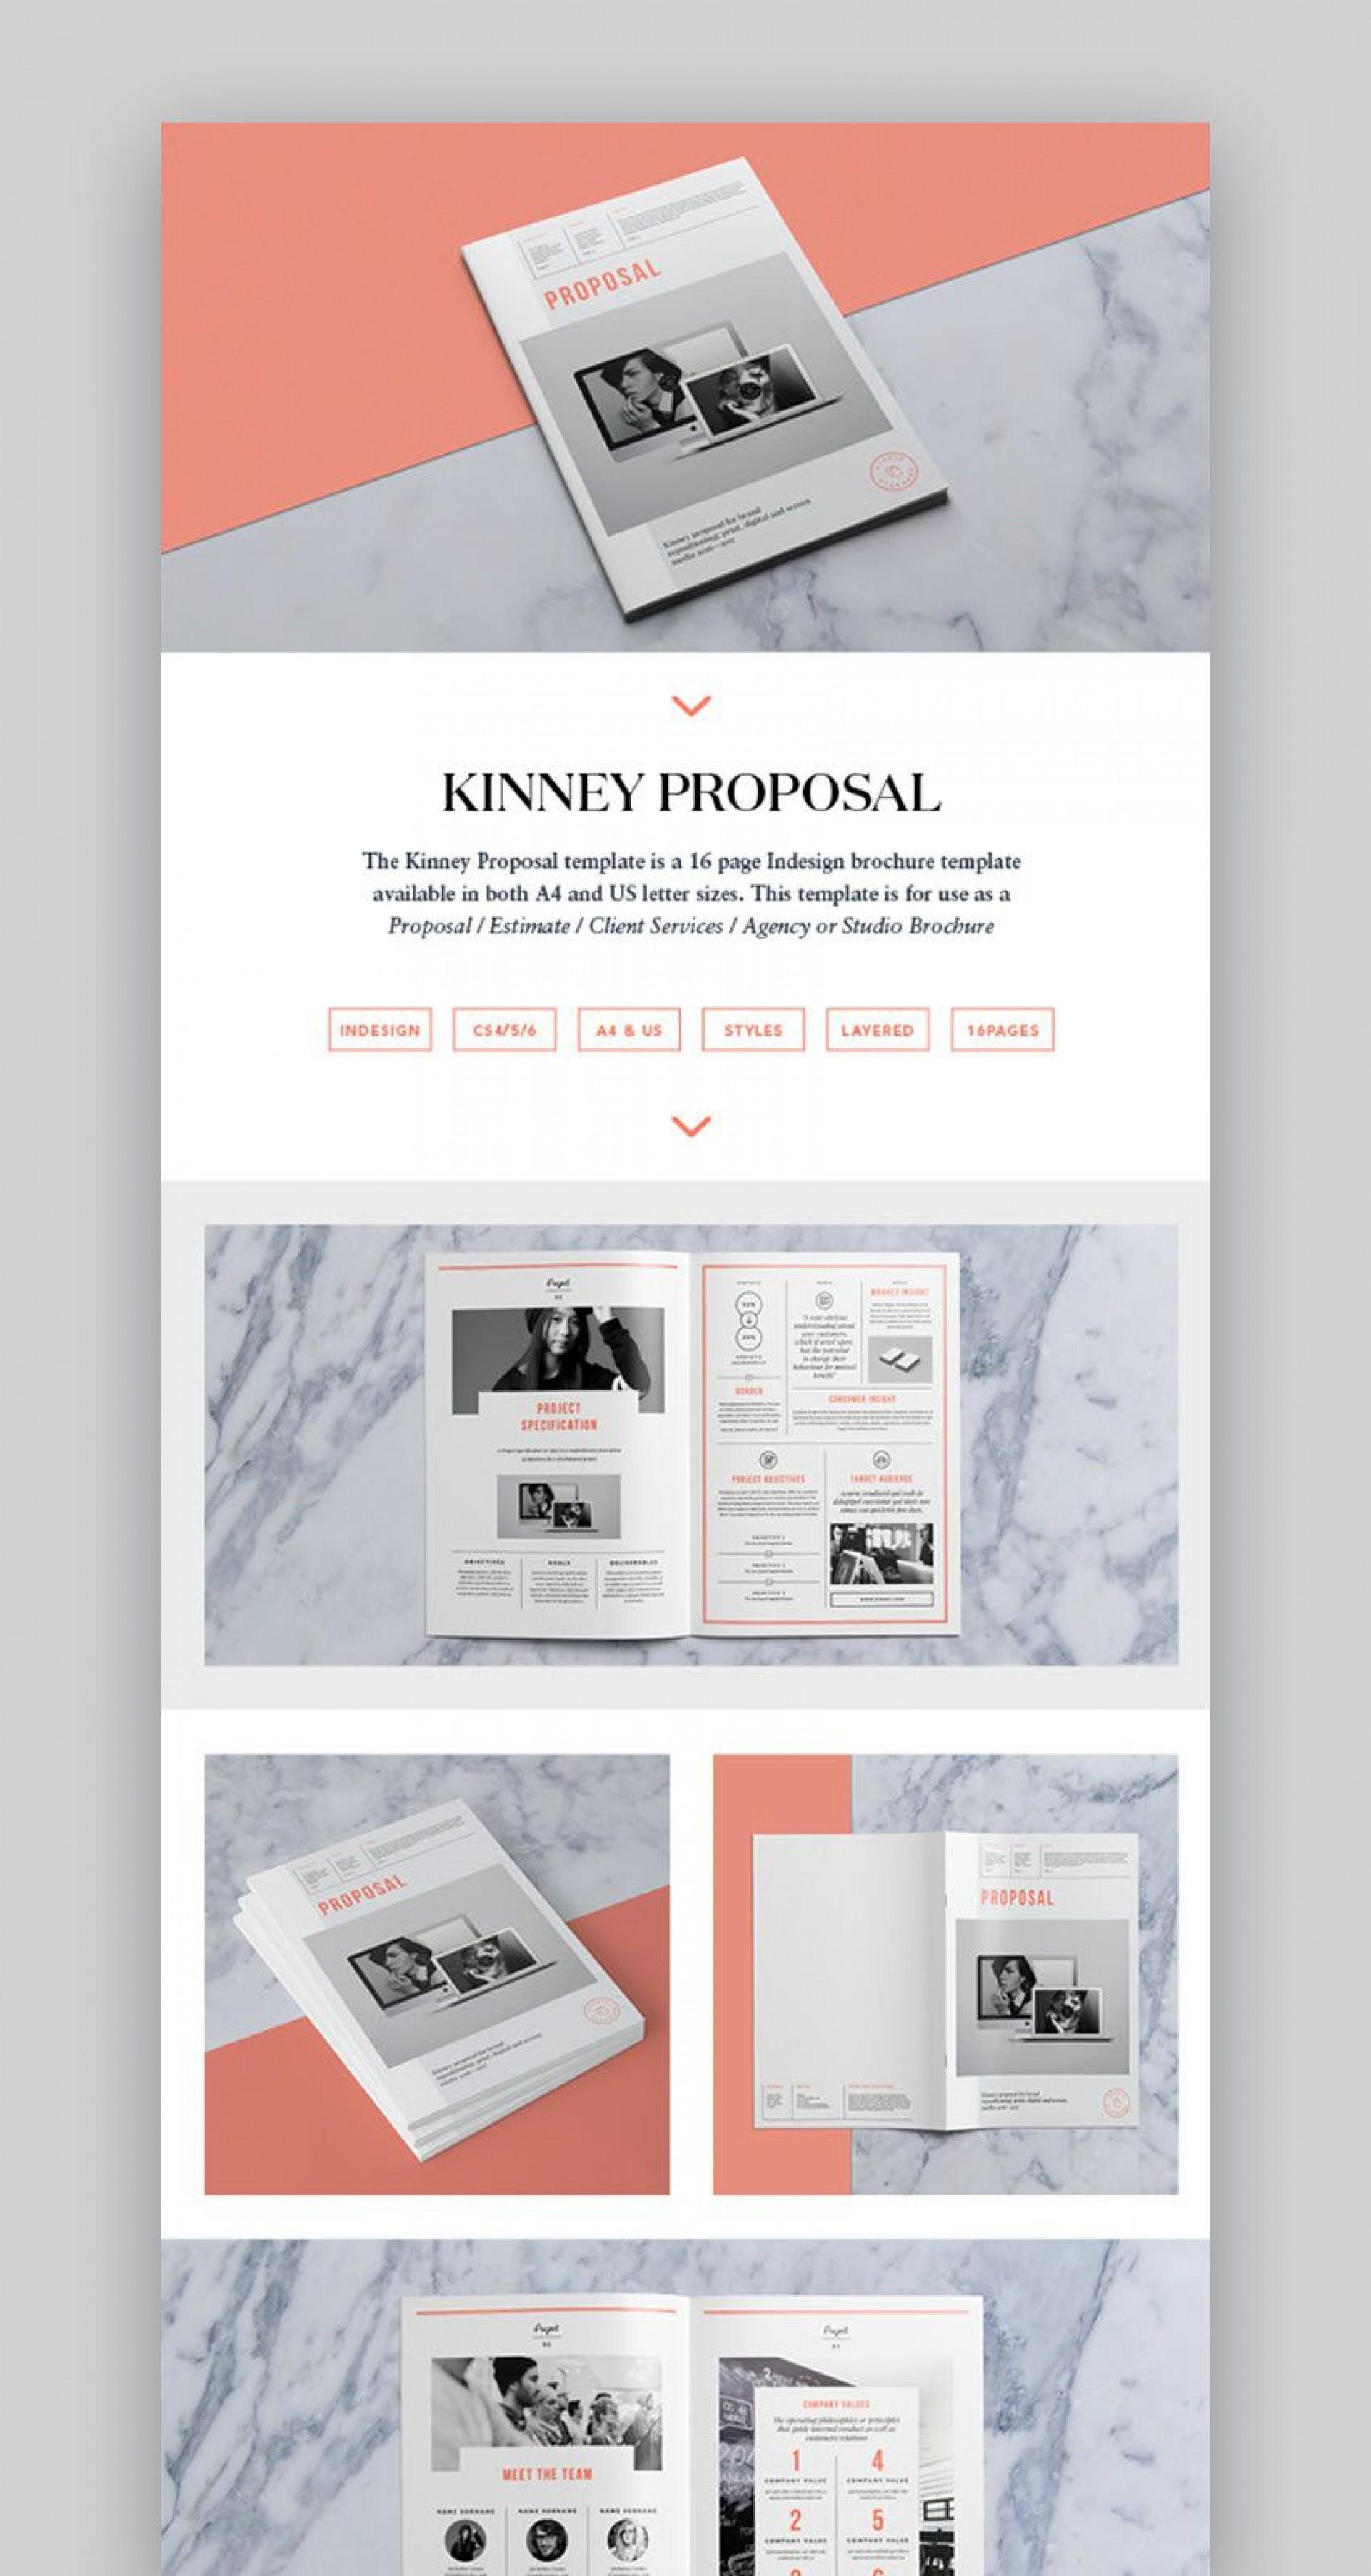 005 Impressive Graphic Design Proposal Sample Inspiration  Pdf Free Template Indesign1920